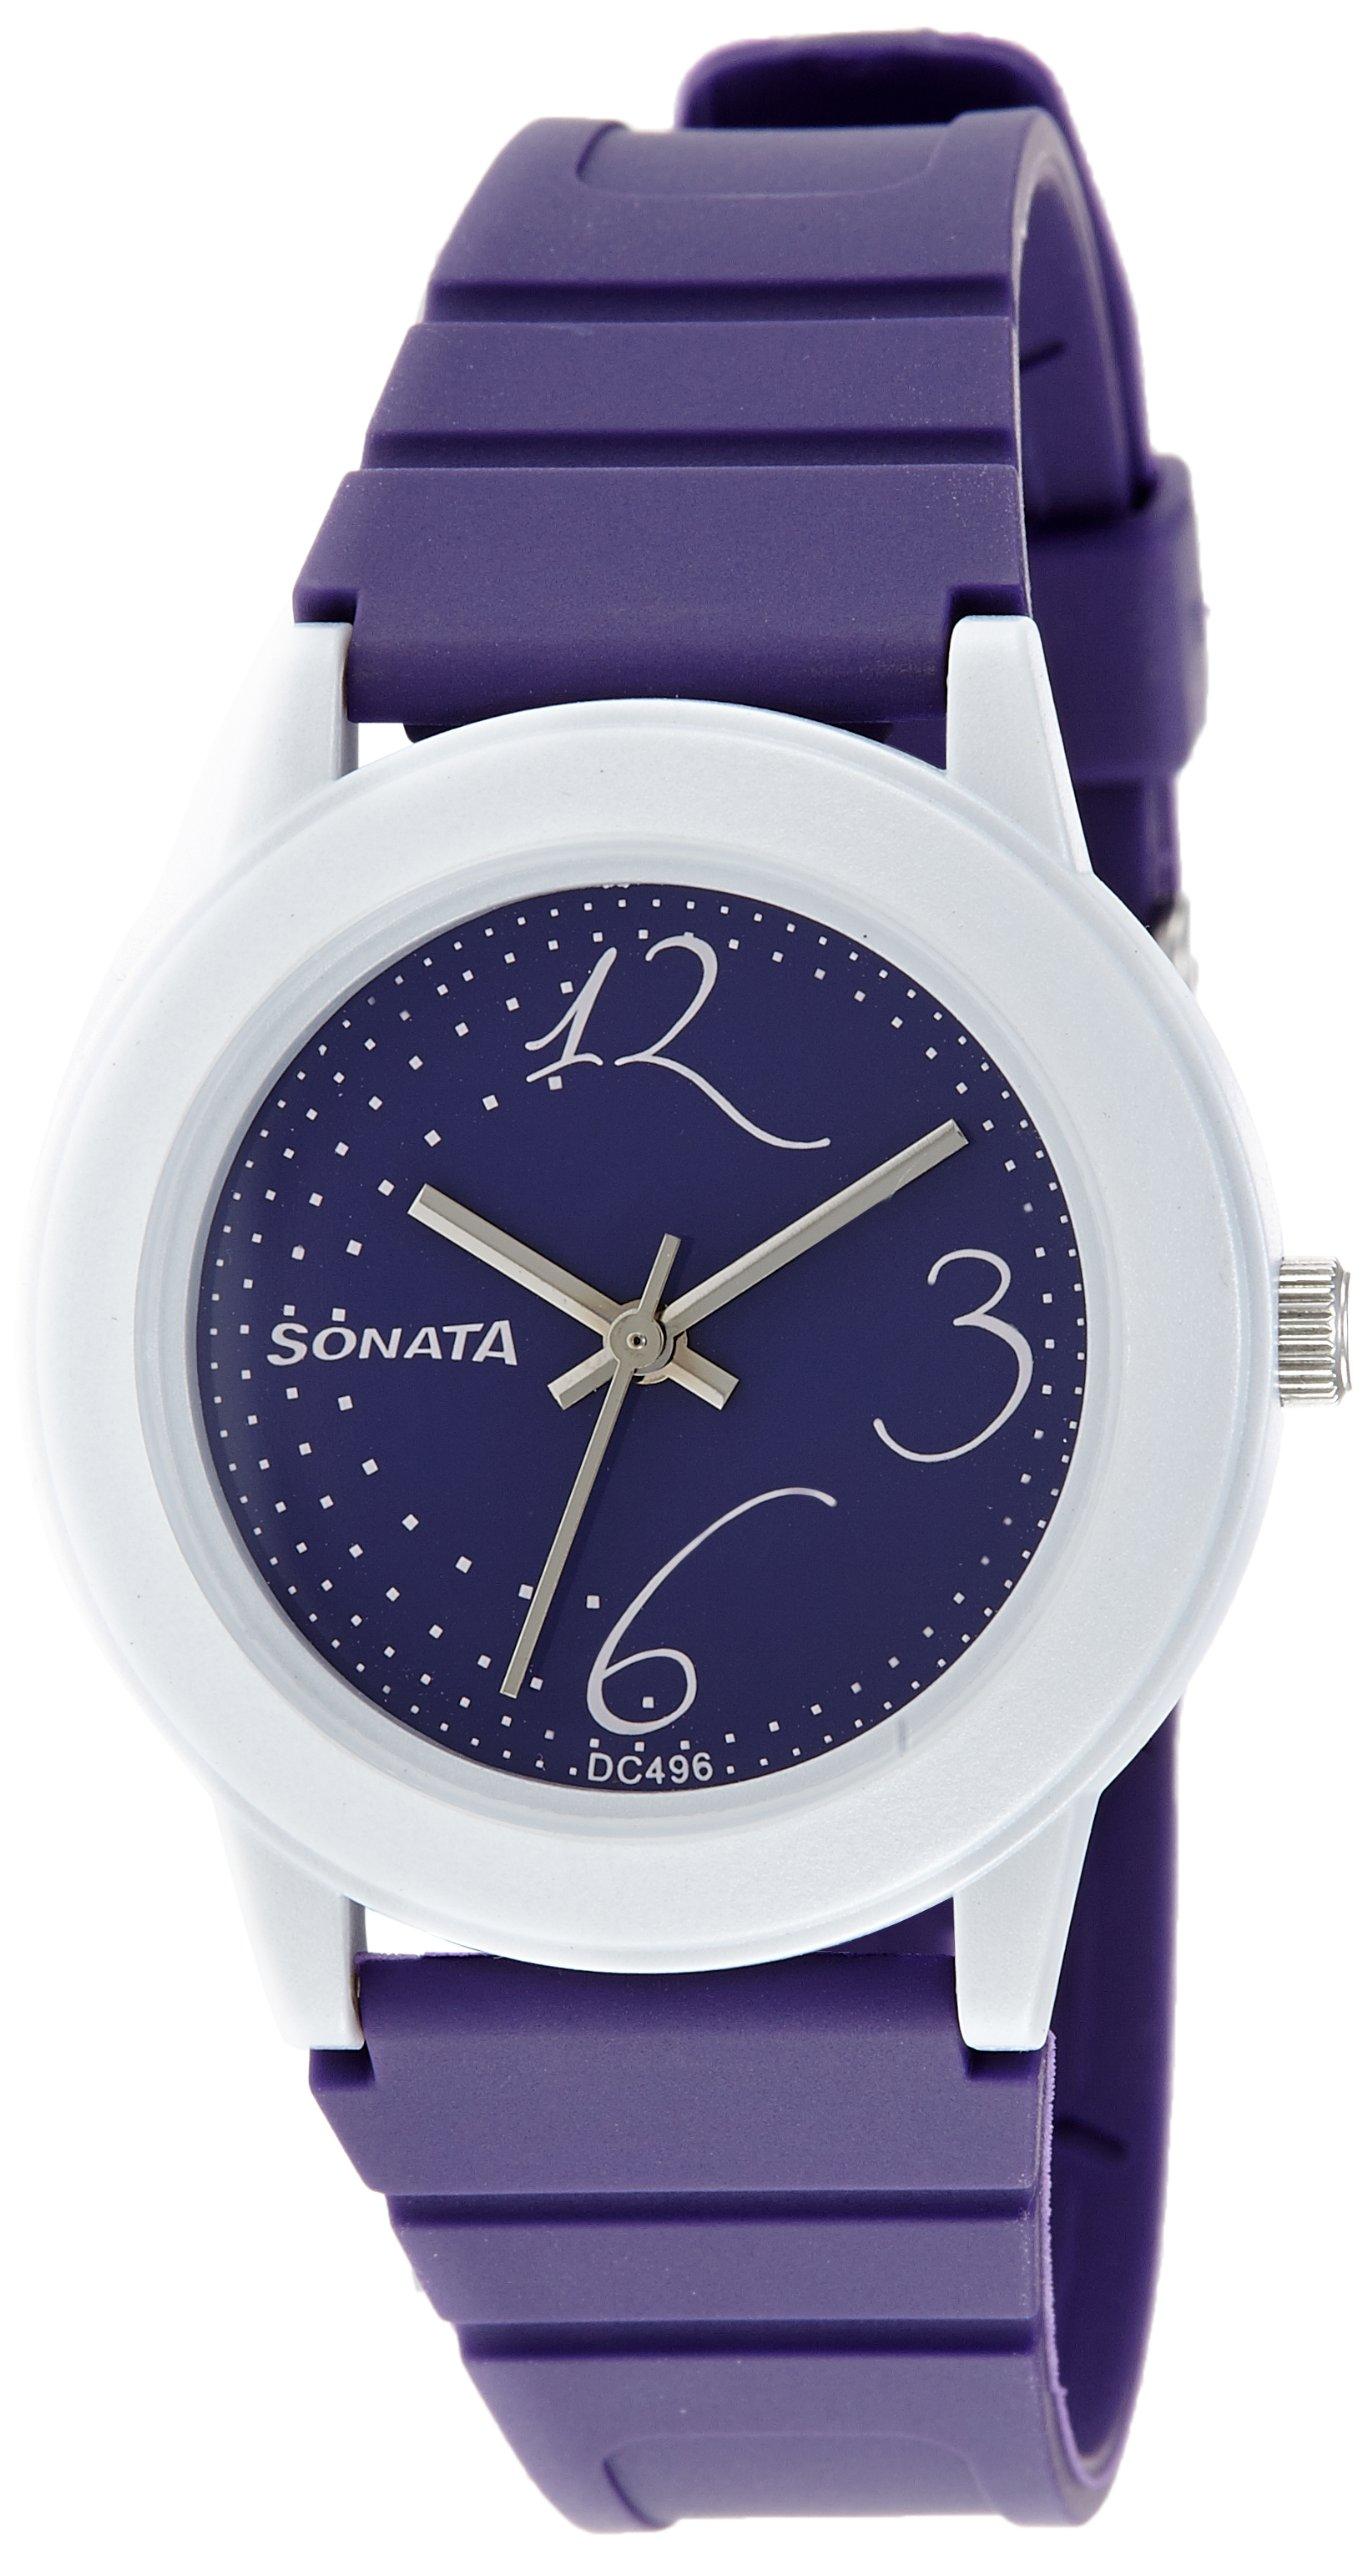 Sonata Fashion Fibre Analog Black Dial Women's Watch -NJ8992PP02C product image